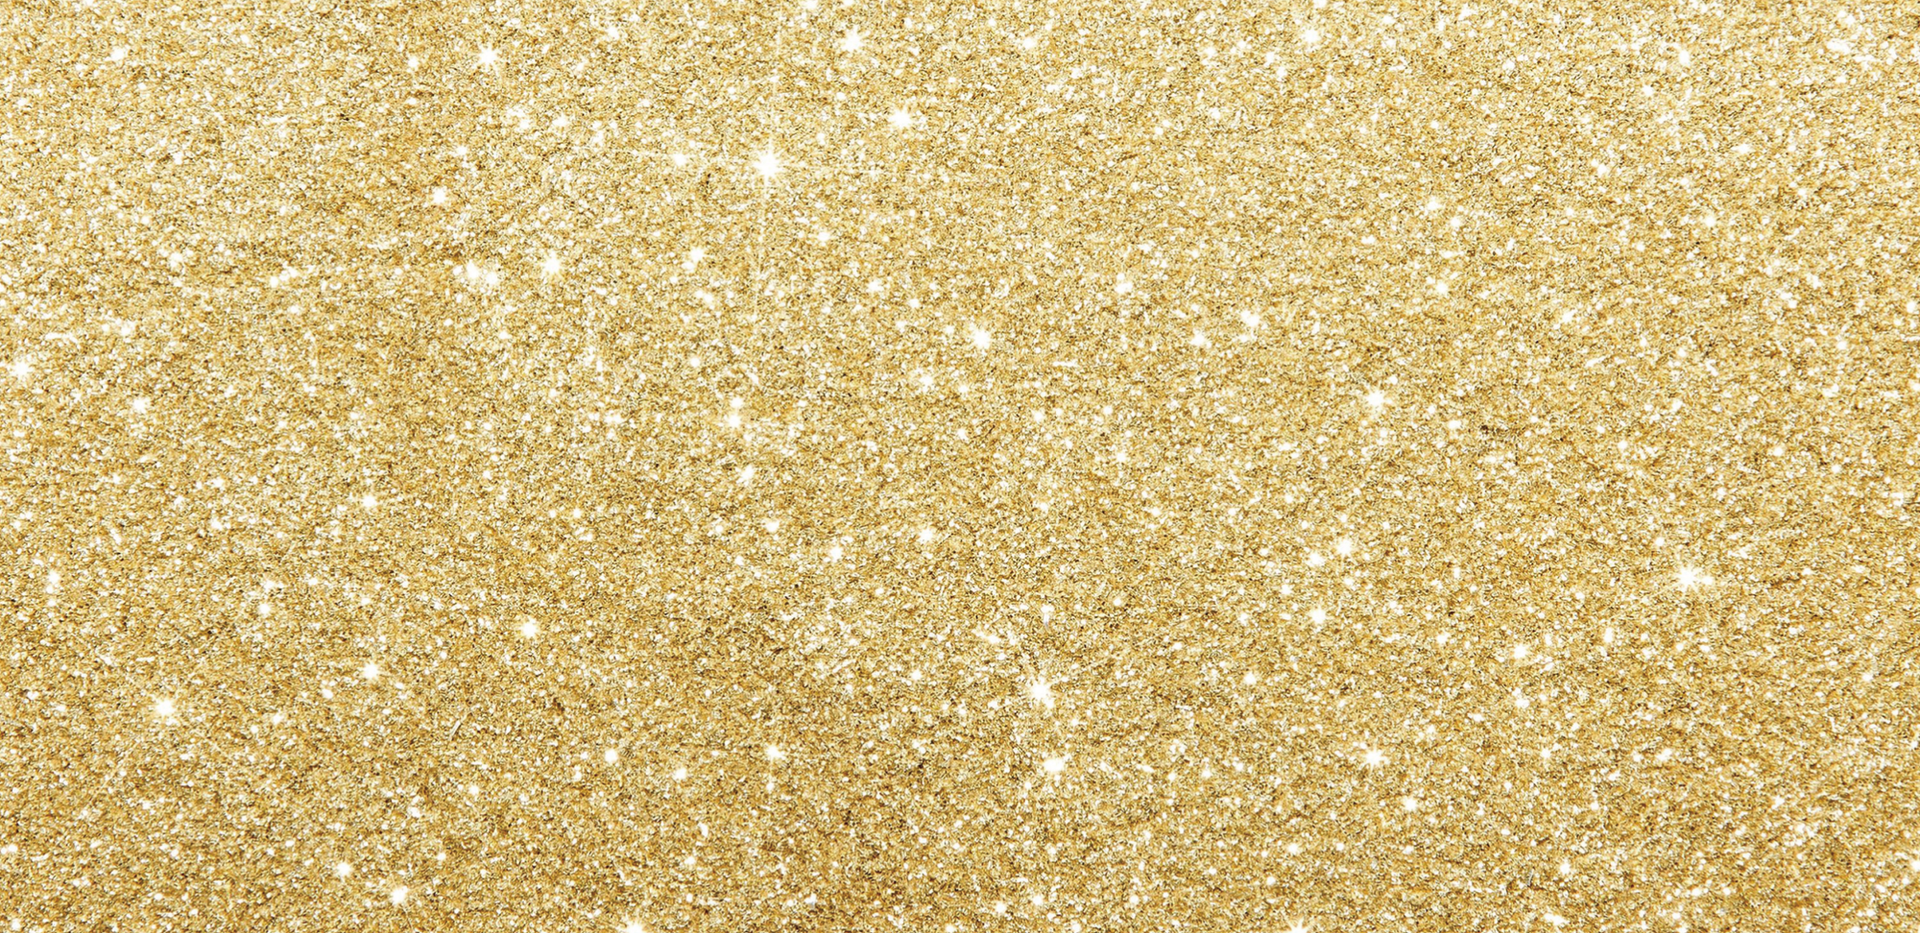 04 Gold Sparkles.png